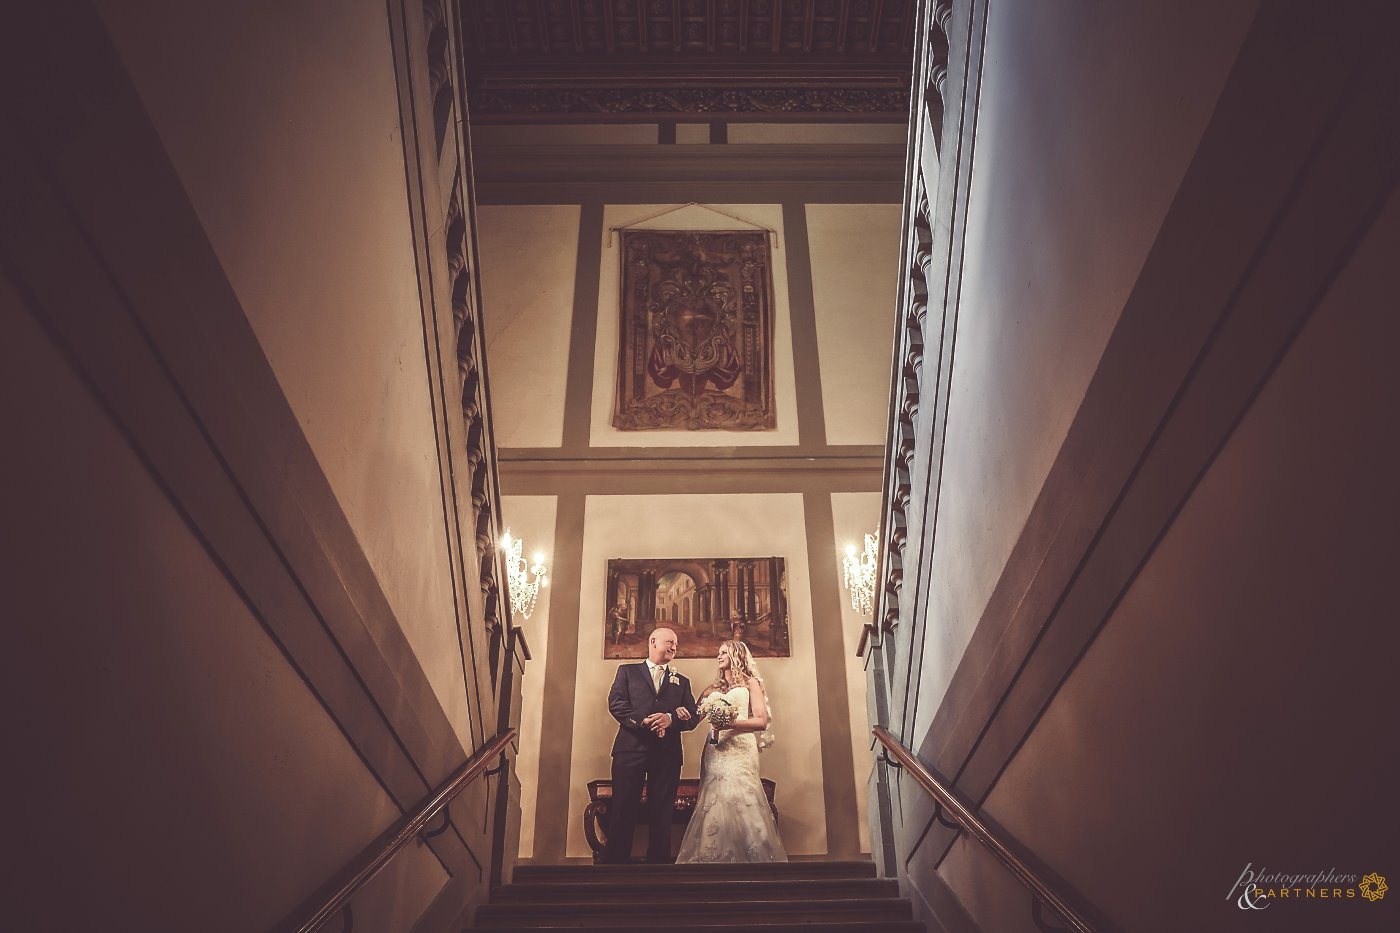 wedding_photos_villa_pitiana_05.jpg